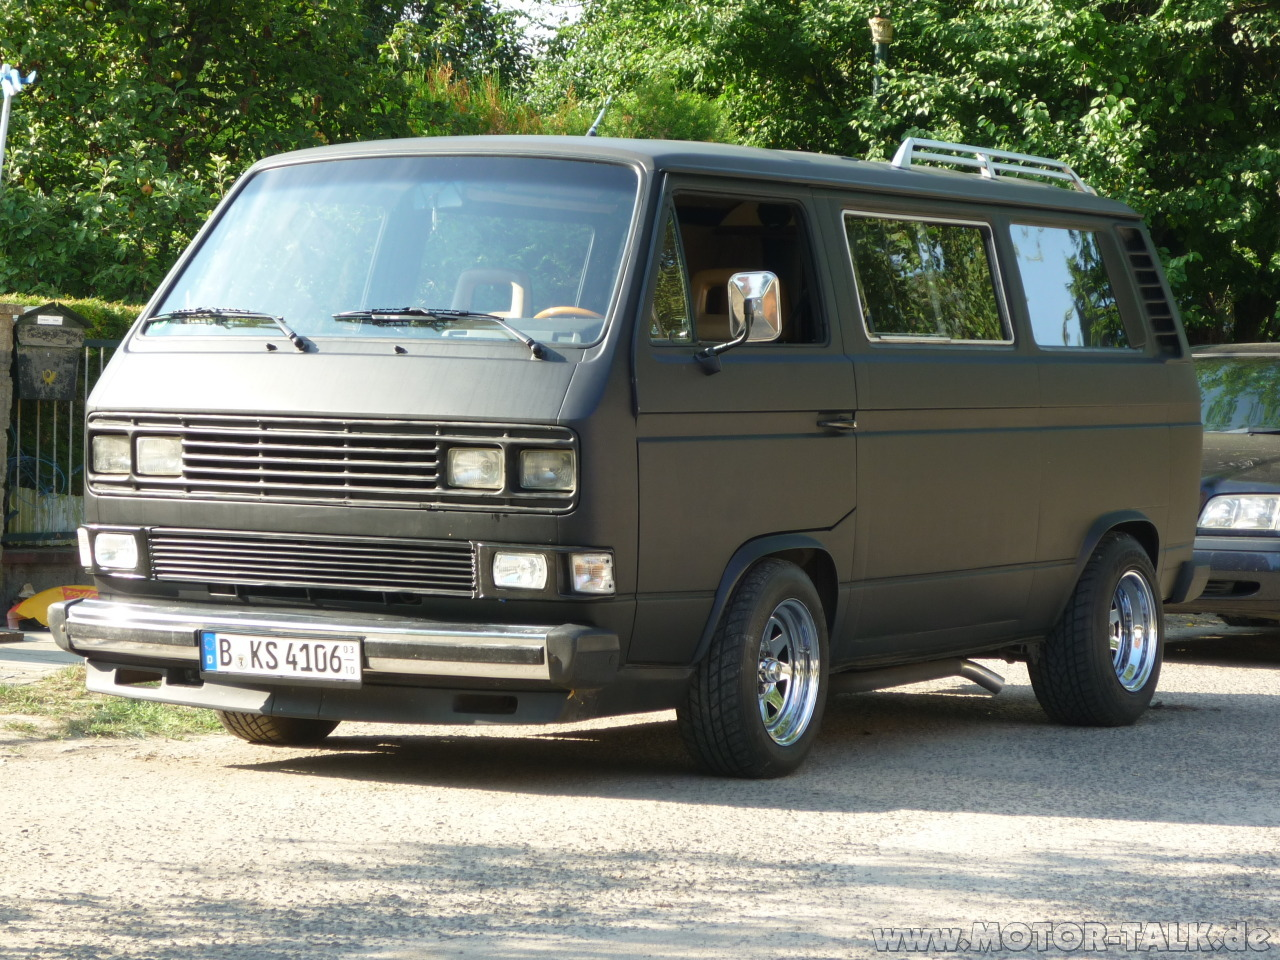 VW T3 history, photos on Better Parts LTD